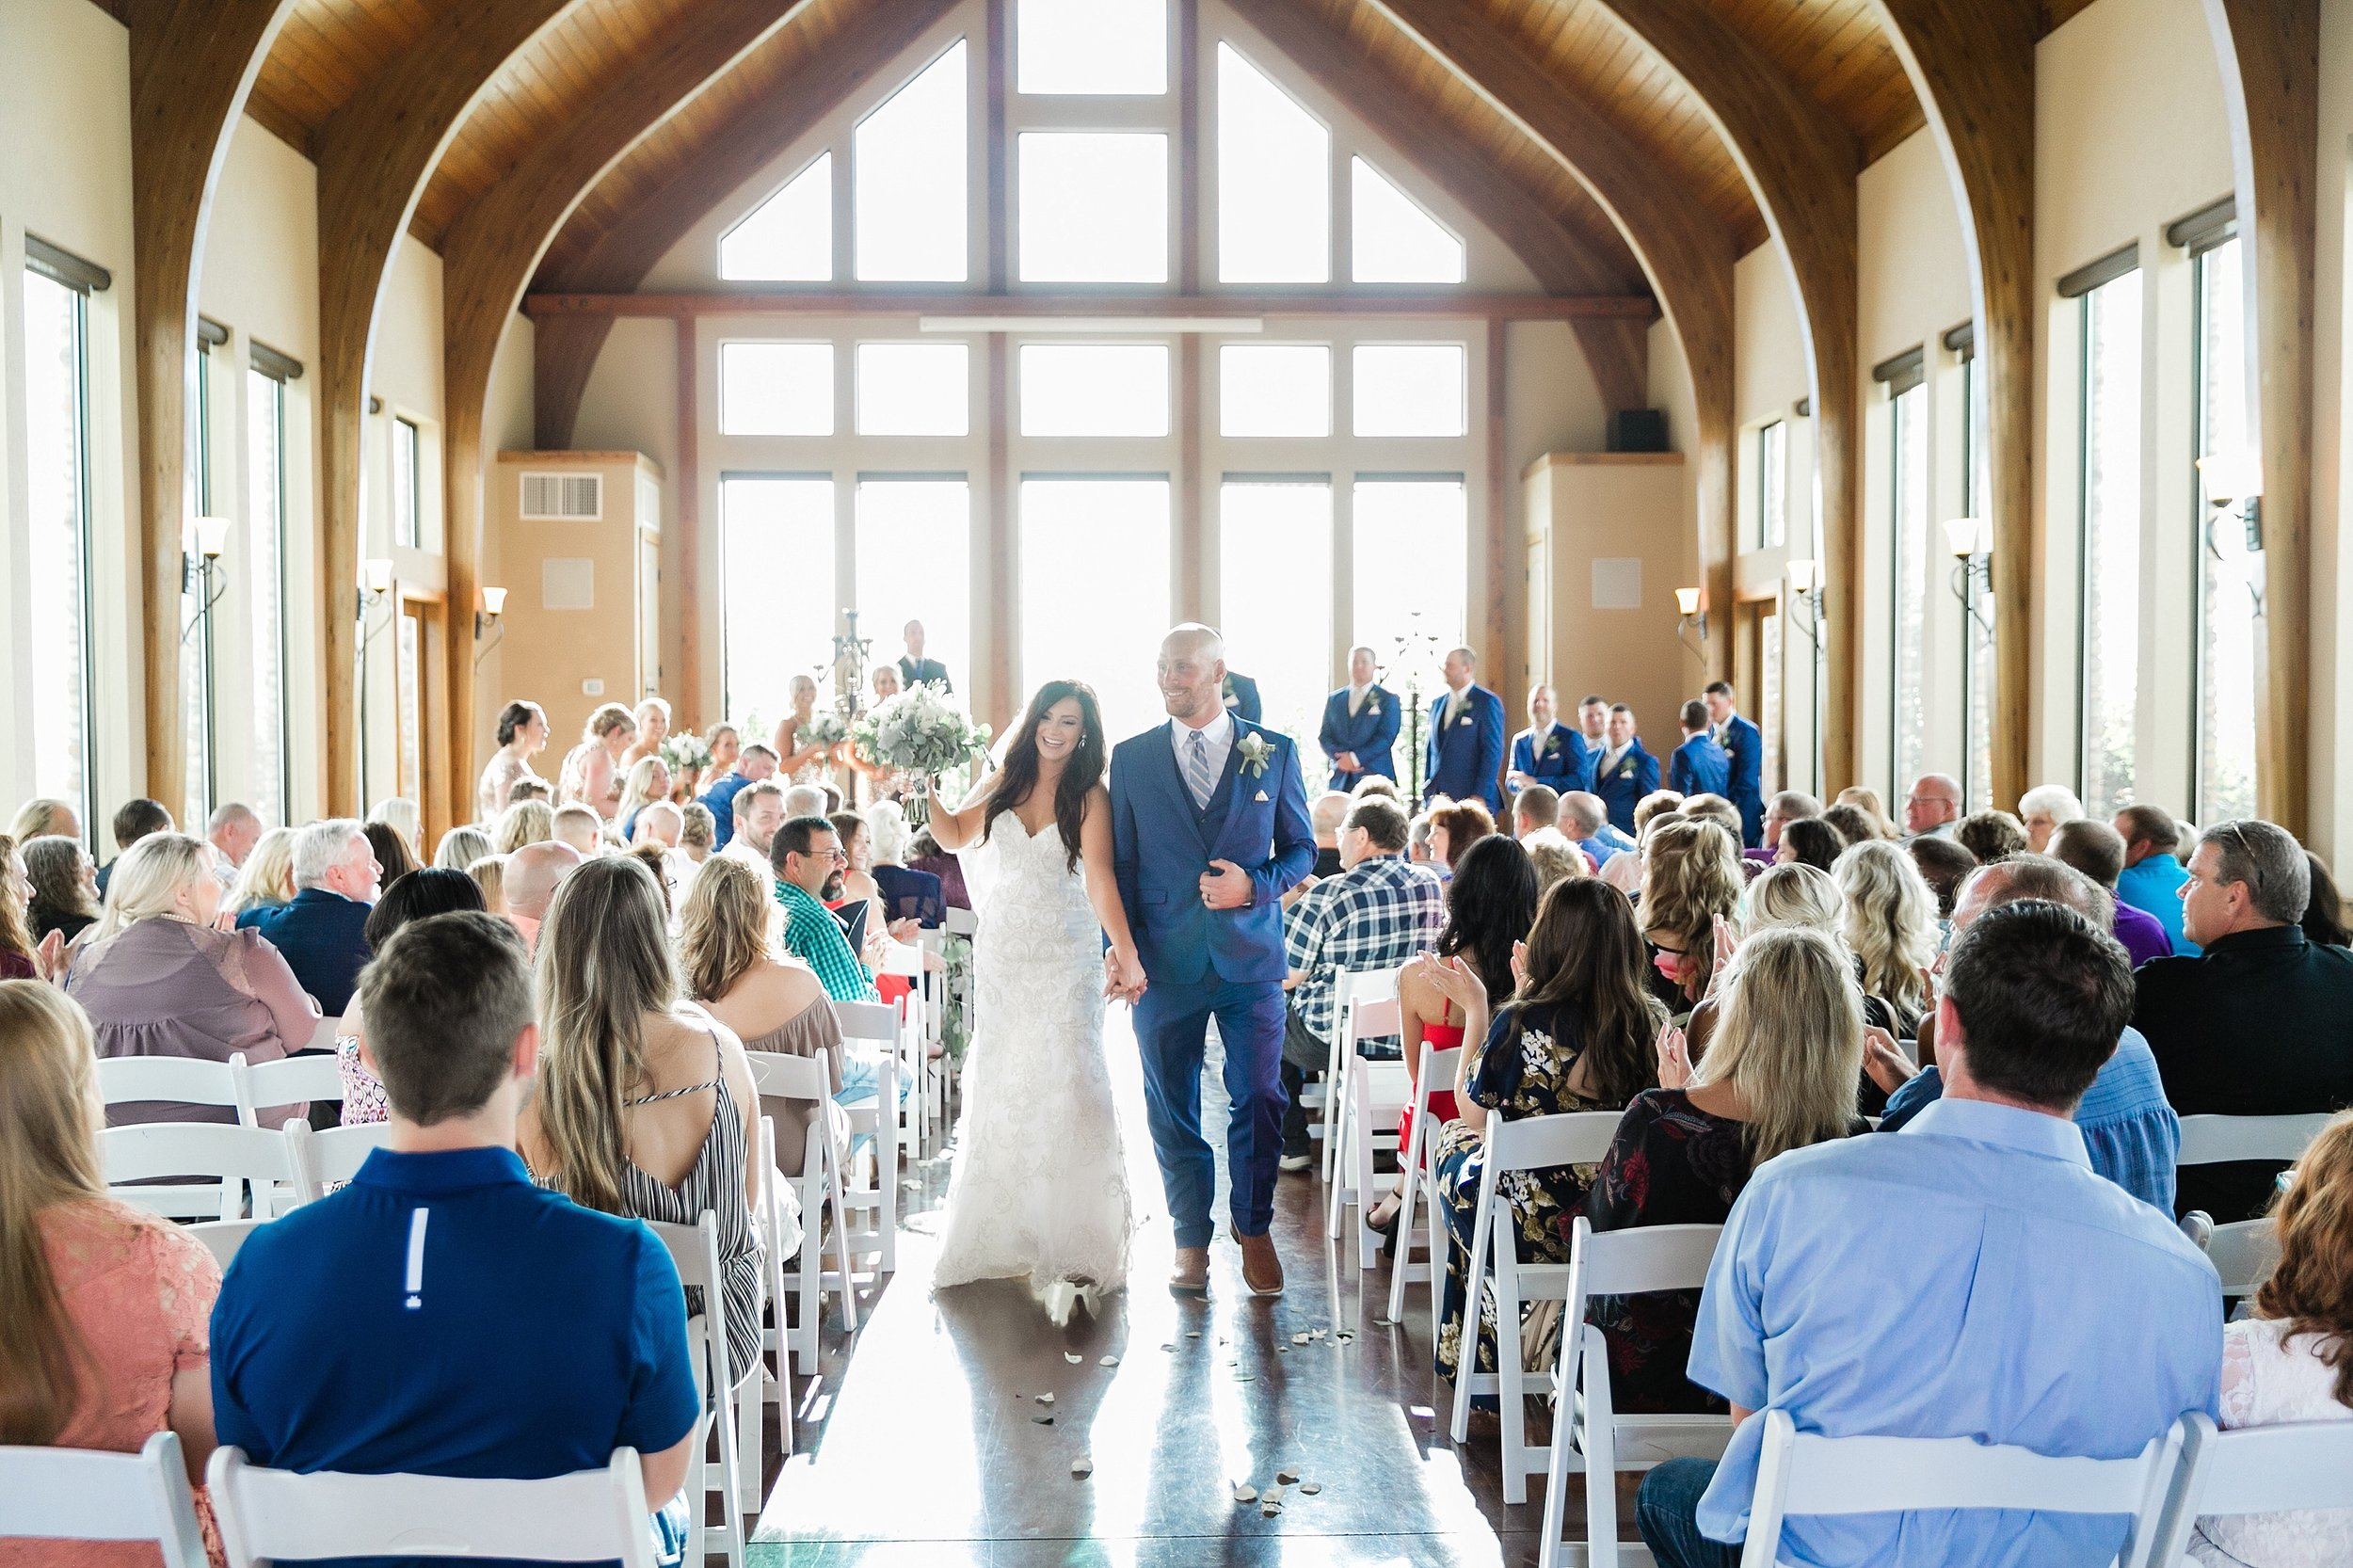 bailey-and-carl-coyote-ranch-resort-wedding-photographer-wichita-falls-texas-destination-wedding-0022.jpg